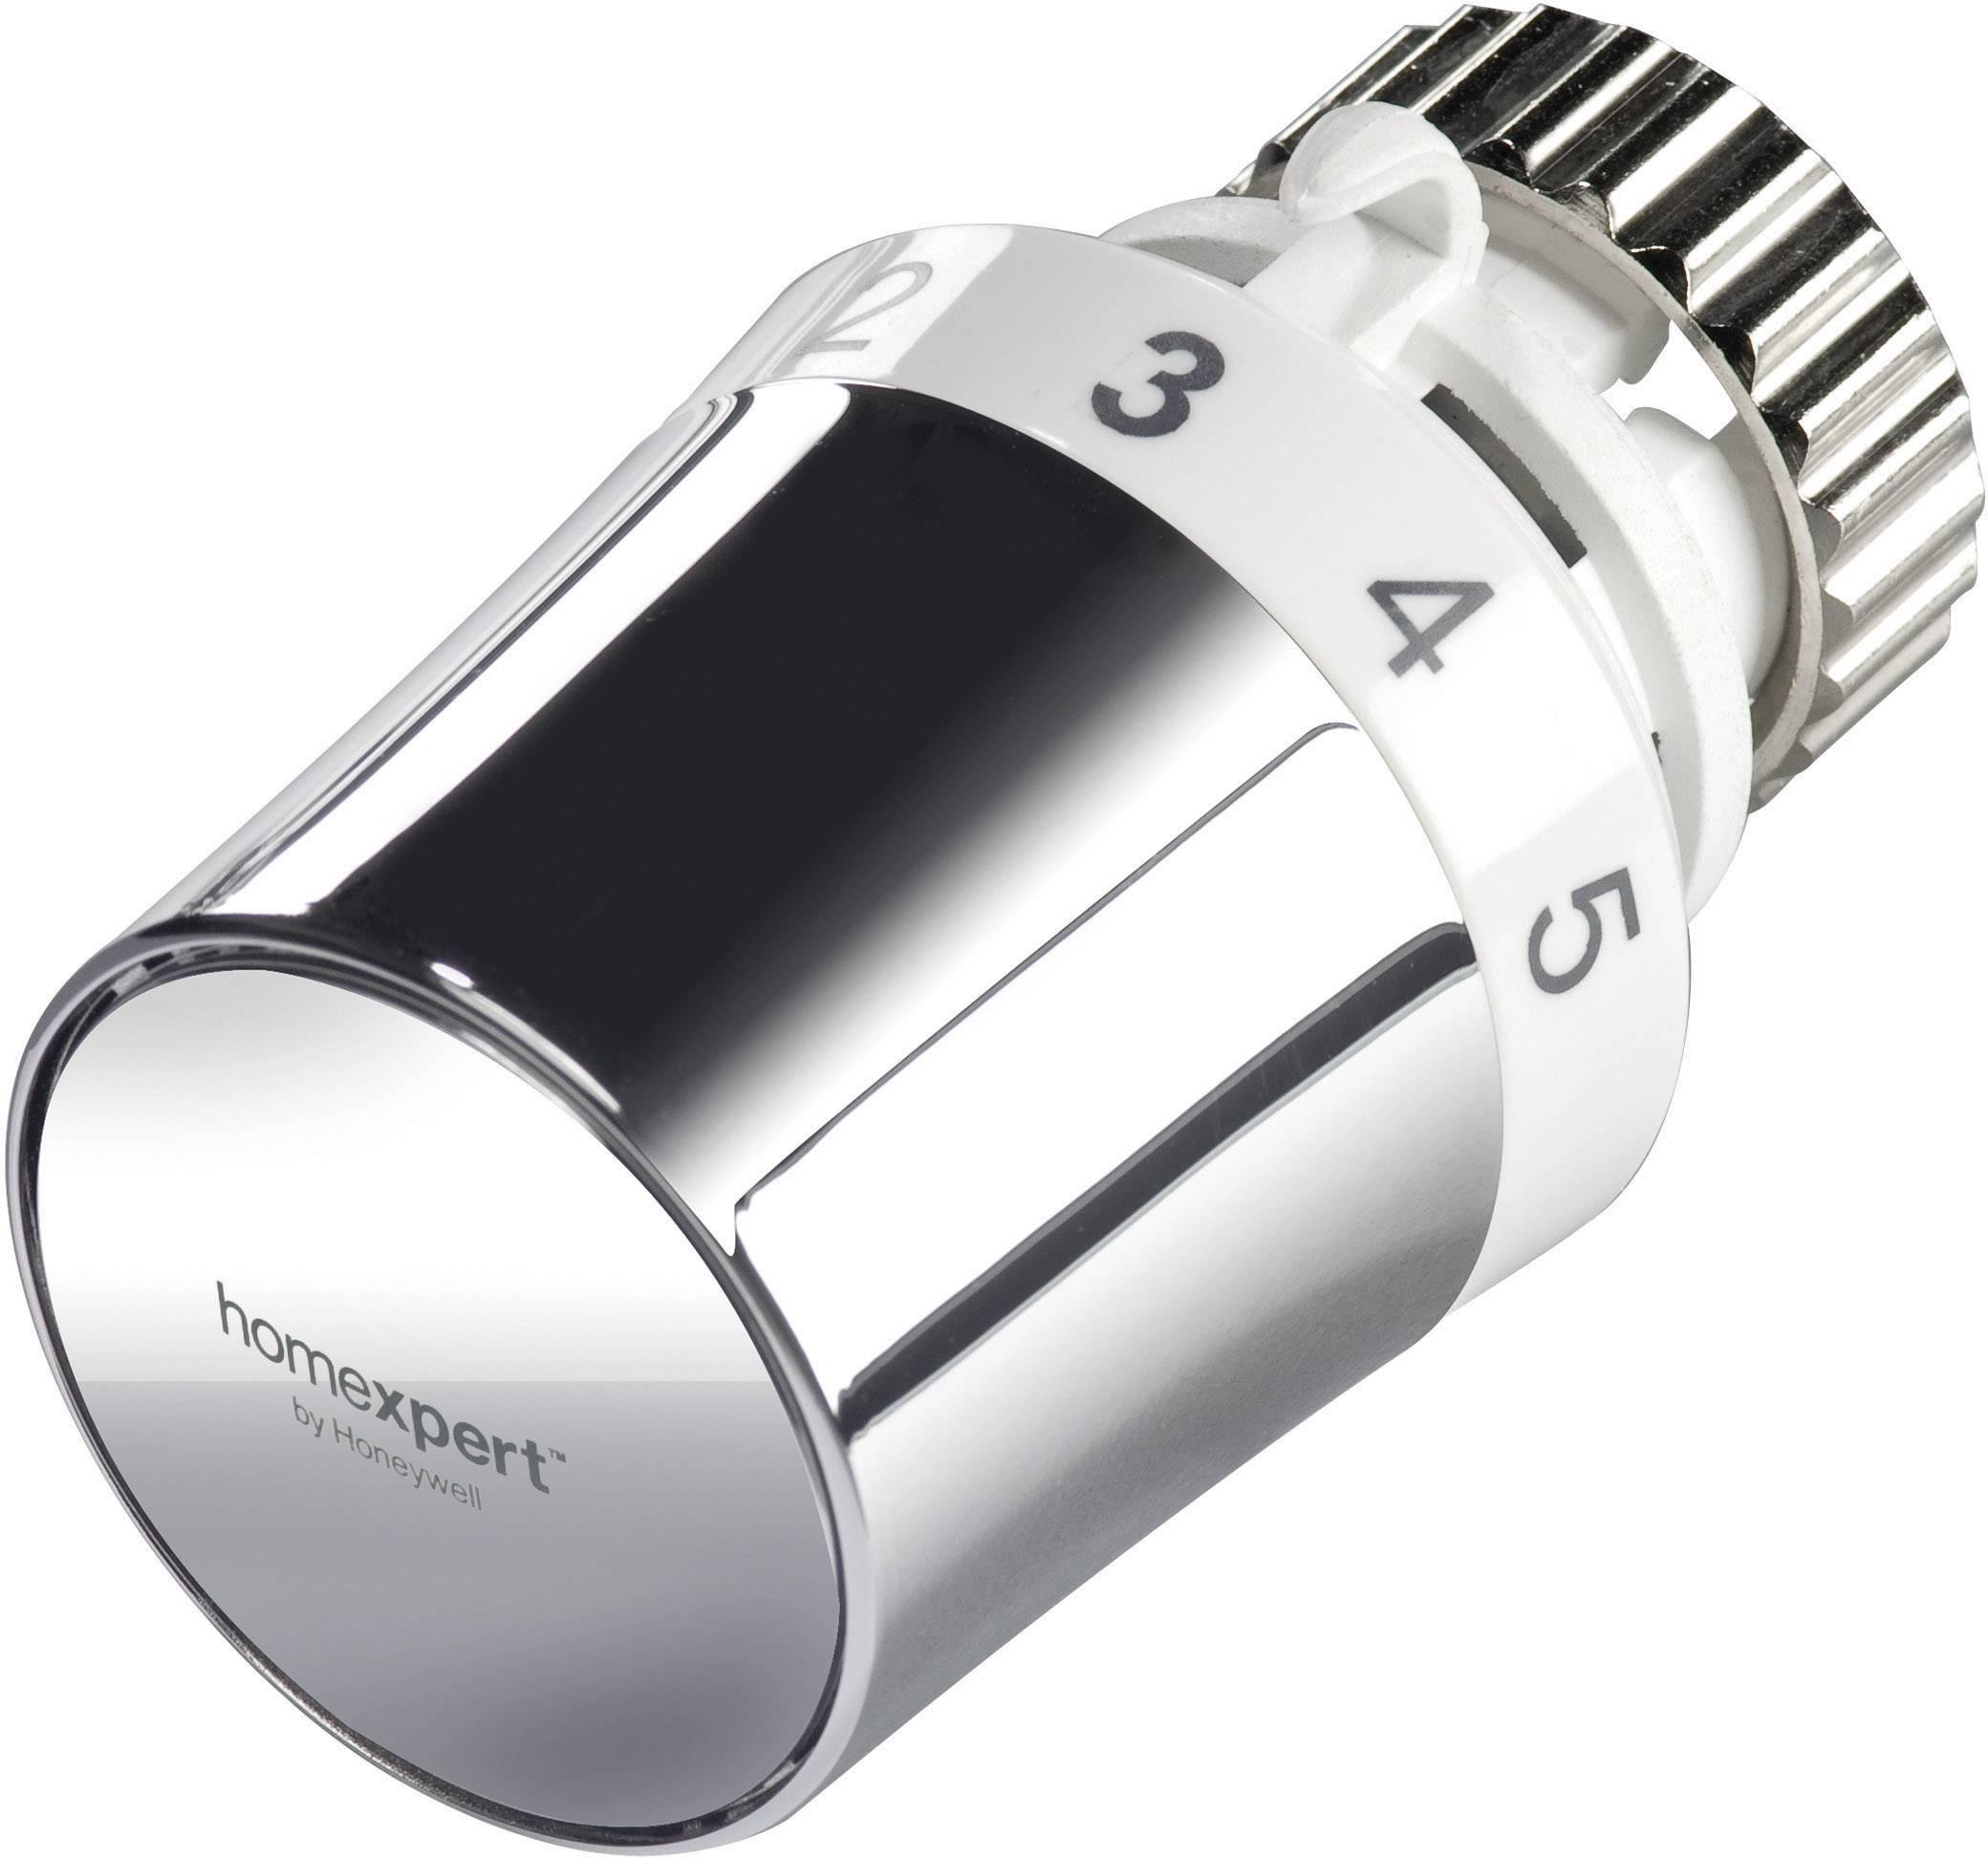 Radiátorová termostatická hlavica Homexpert by Honeywell TRH7M30WGE TRH7M30WGE, 1 do 28 °C